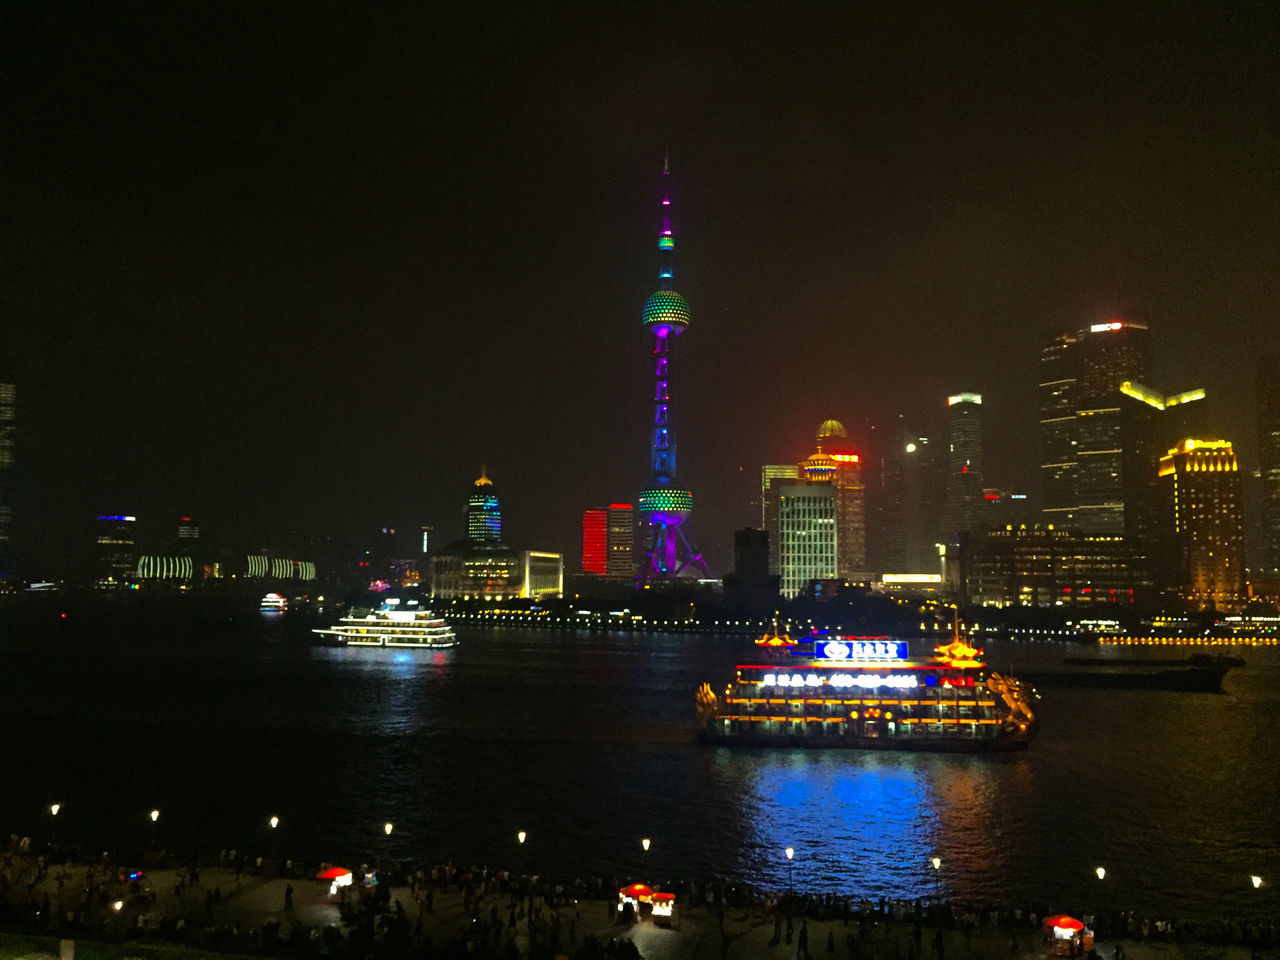 Architecture City Cityscape Illuminated Night Pearl Tower  Shanghai Skyline At Night Skyscraper Travel Travel Destinations